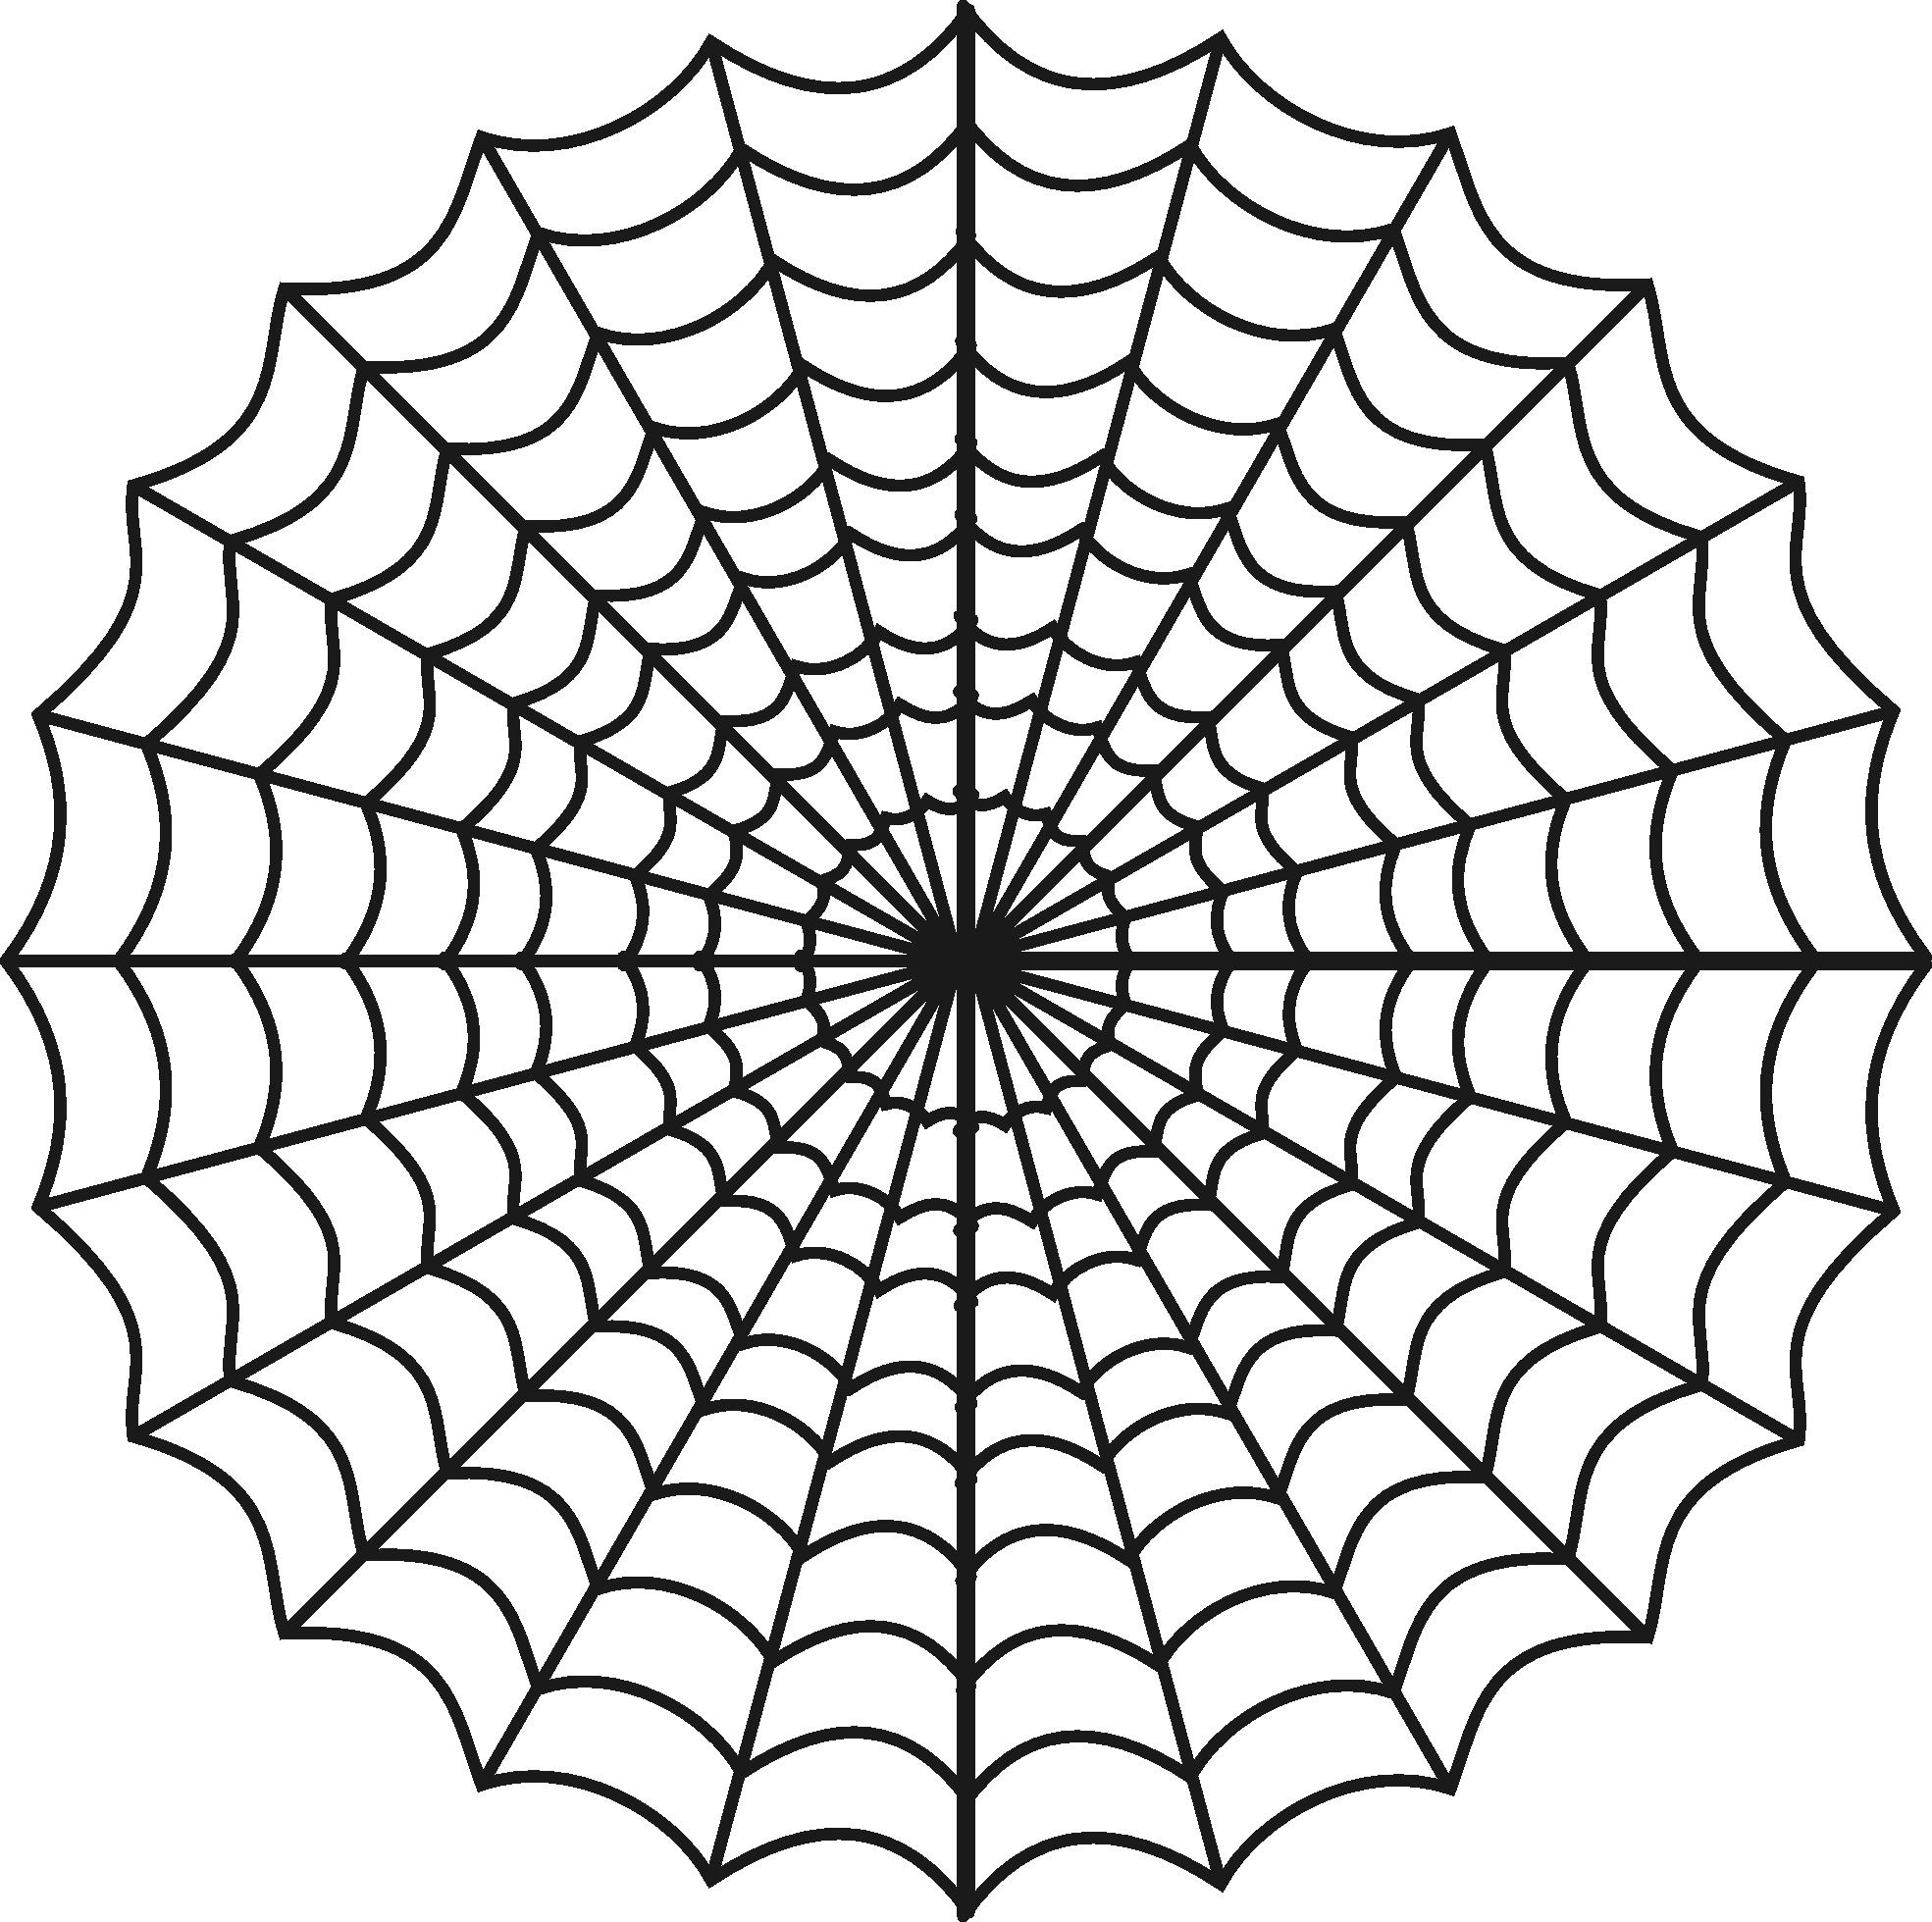 Spider printable